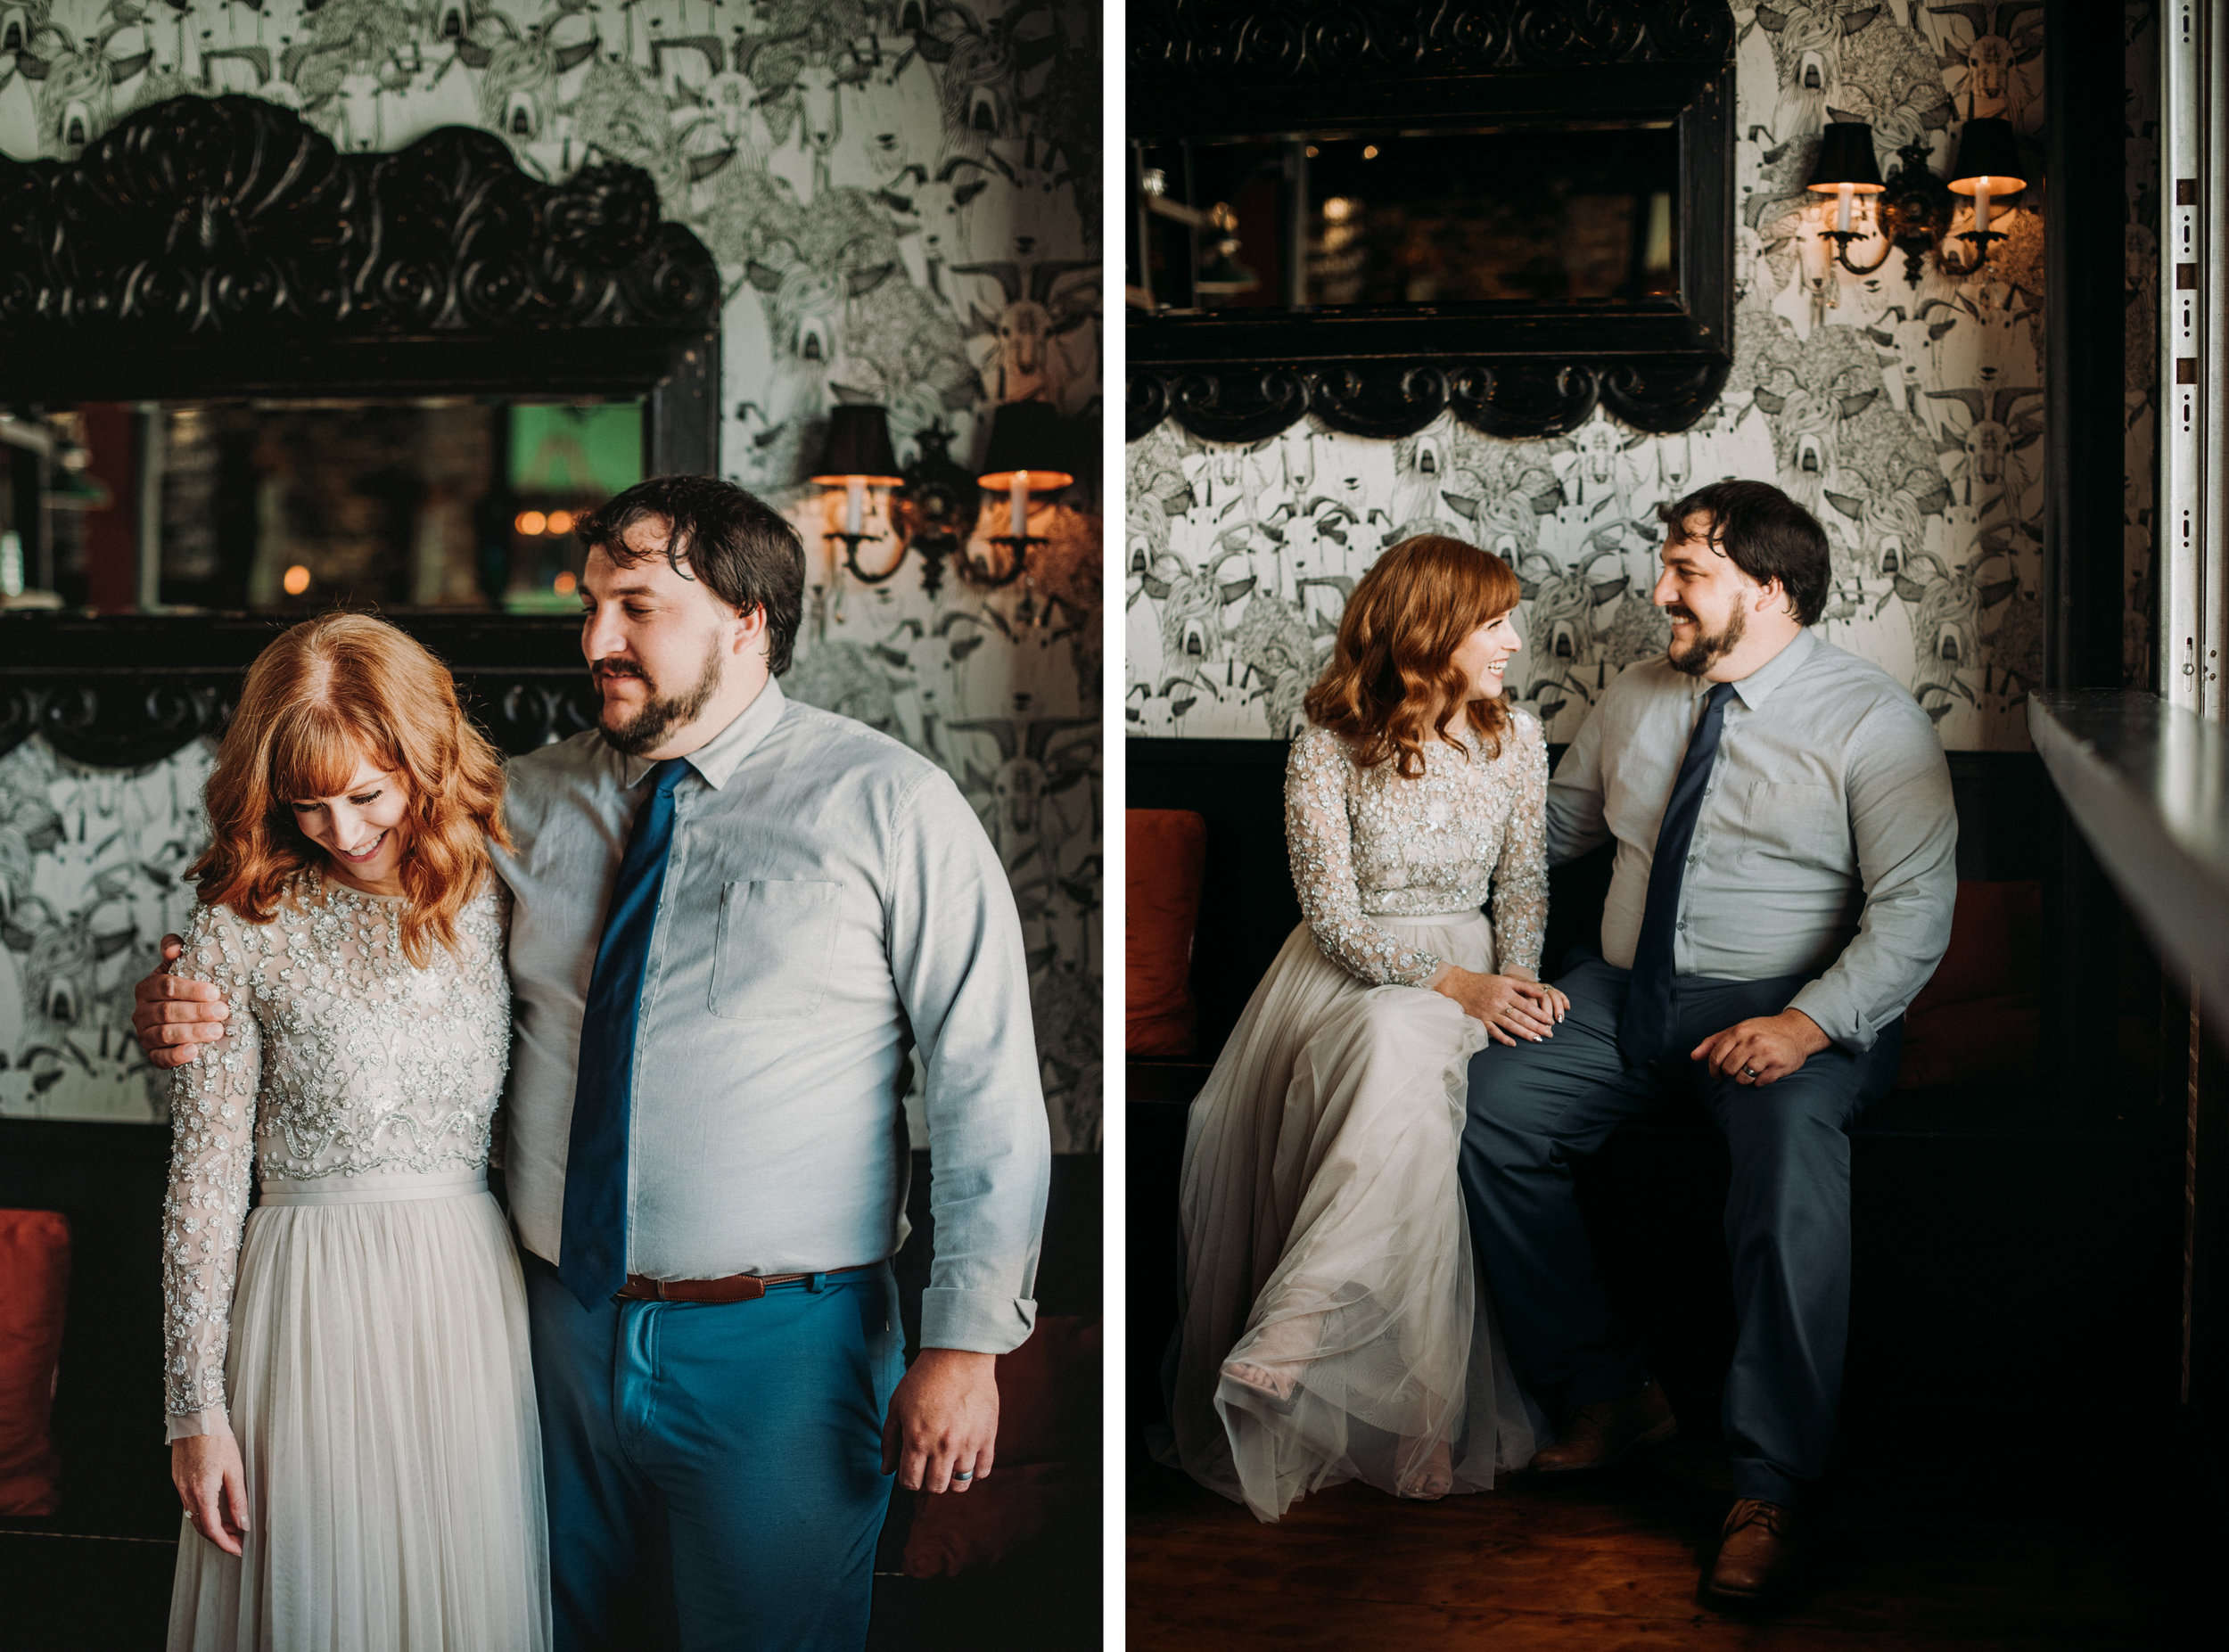 Philadelphia-wedding-photographer-la-cabra-brewery-diy-Peaberry-Photography-015.jpg